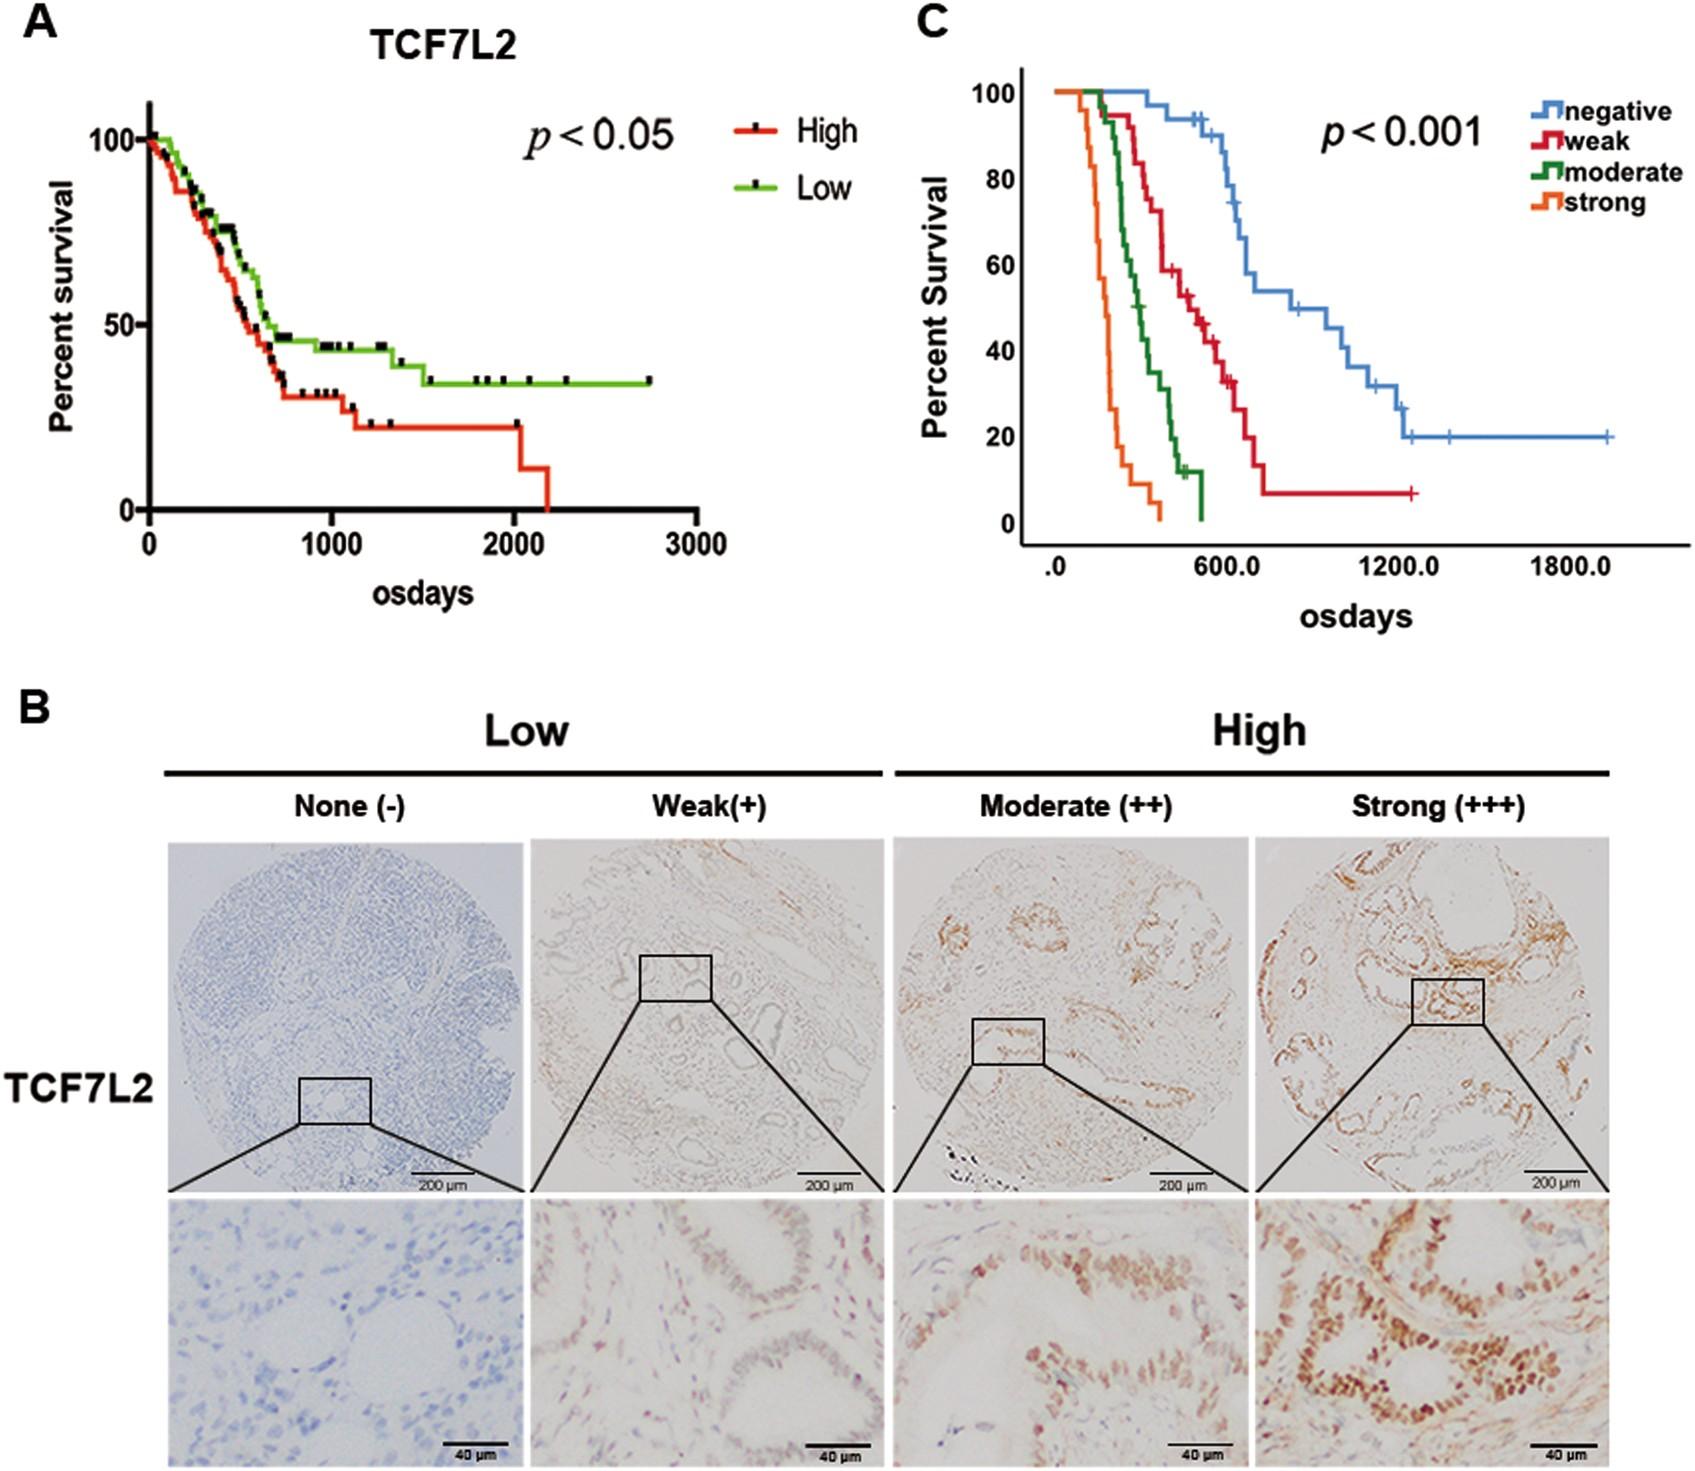 TCF7L2 positively regulates aerobic glycolysis via the EGLN2